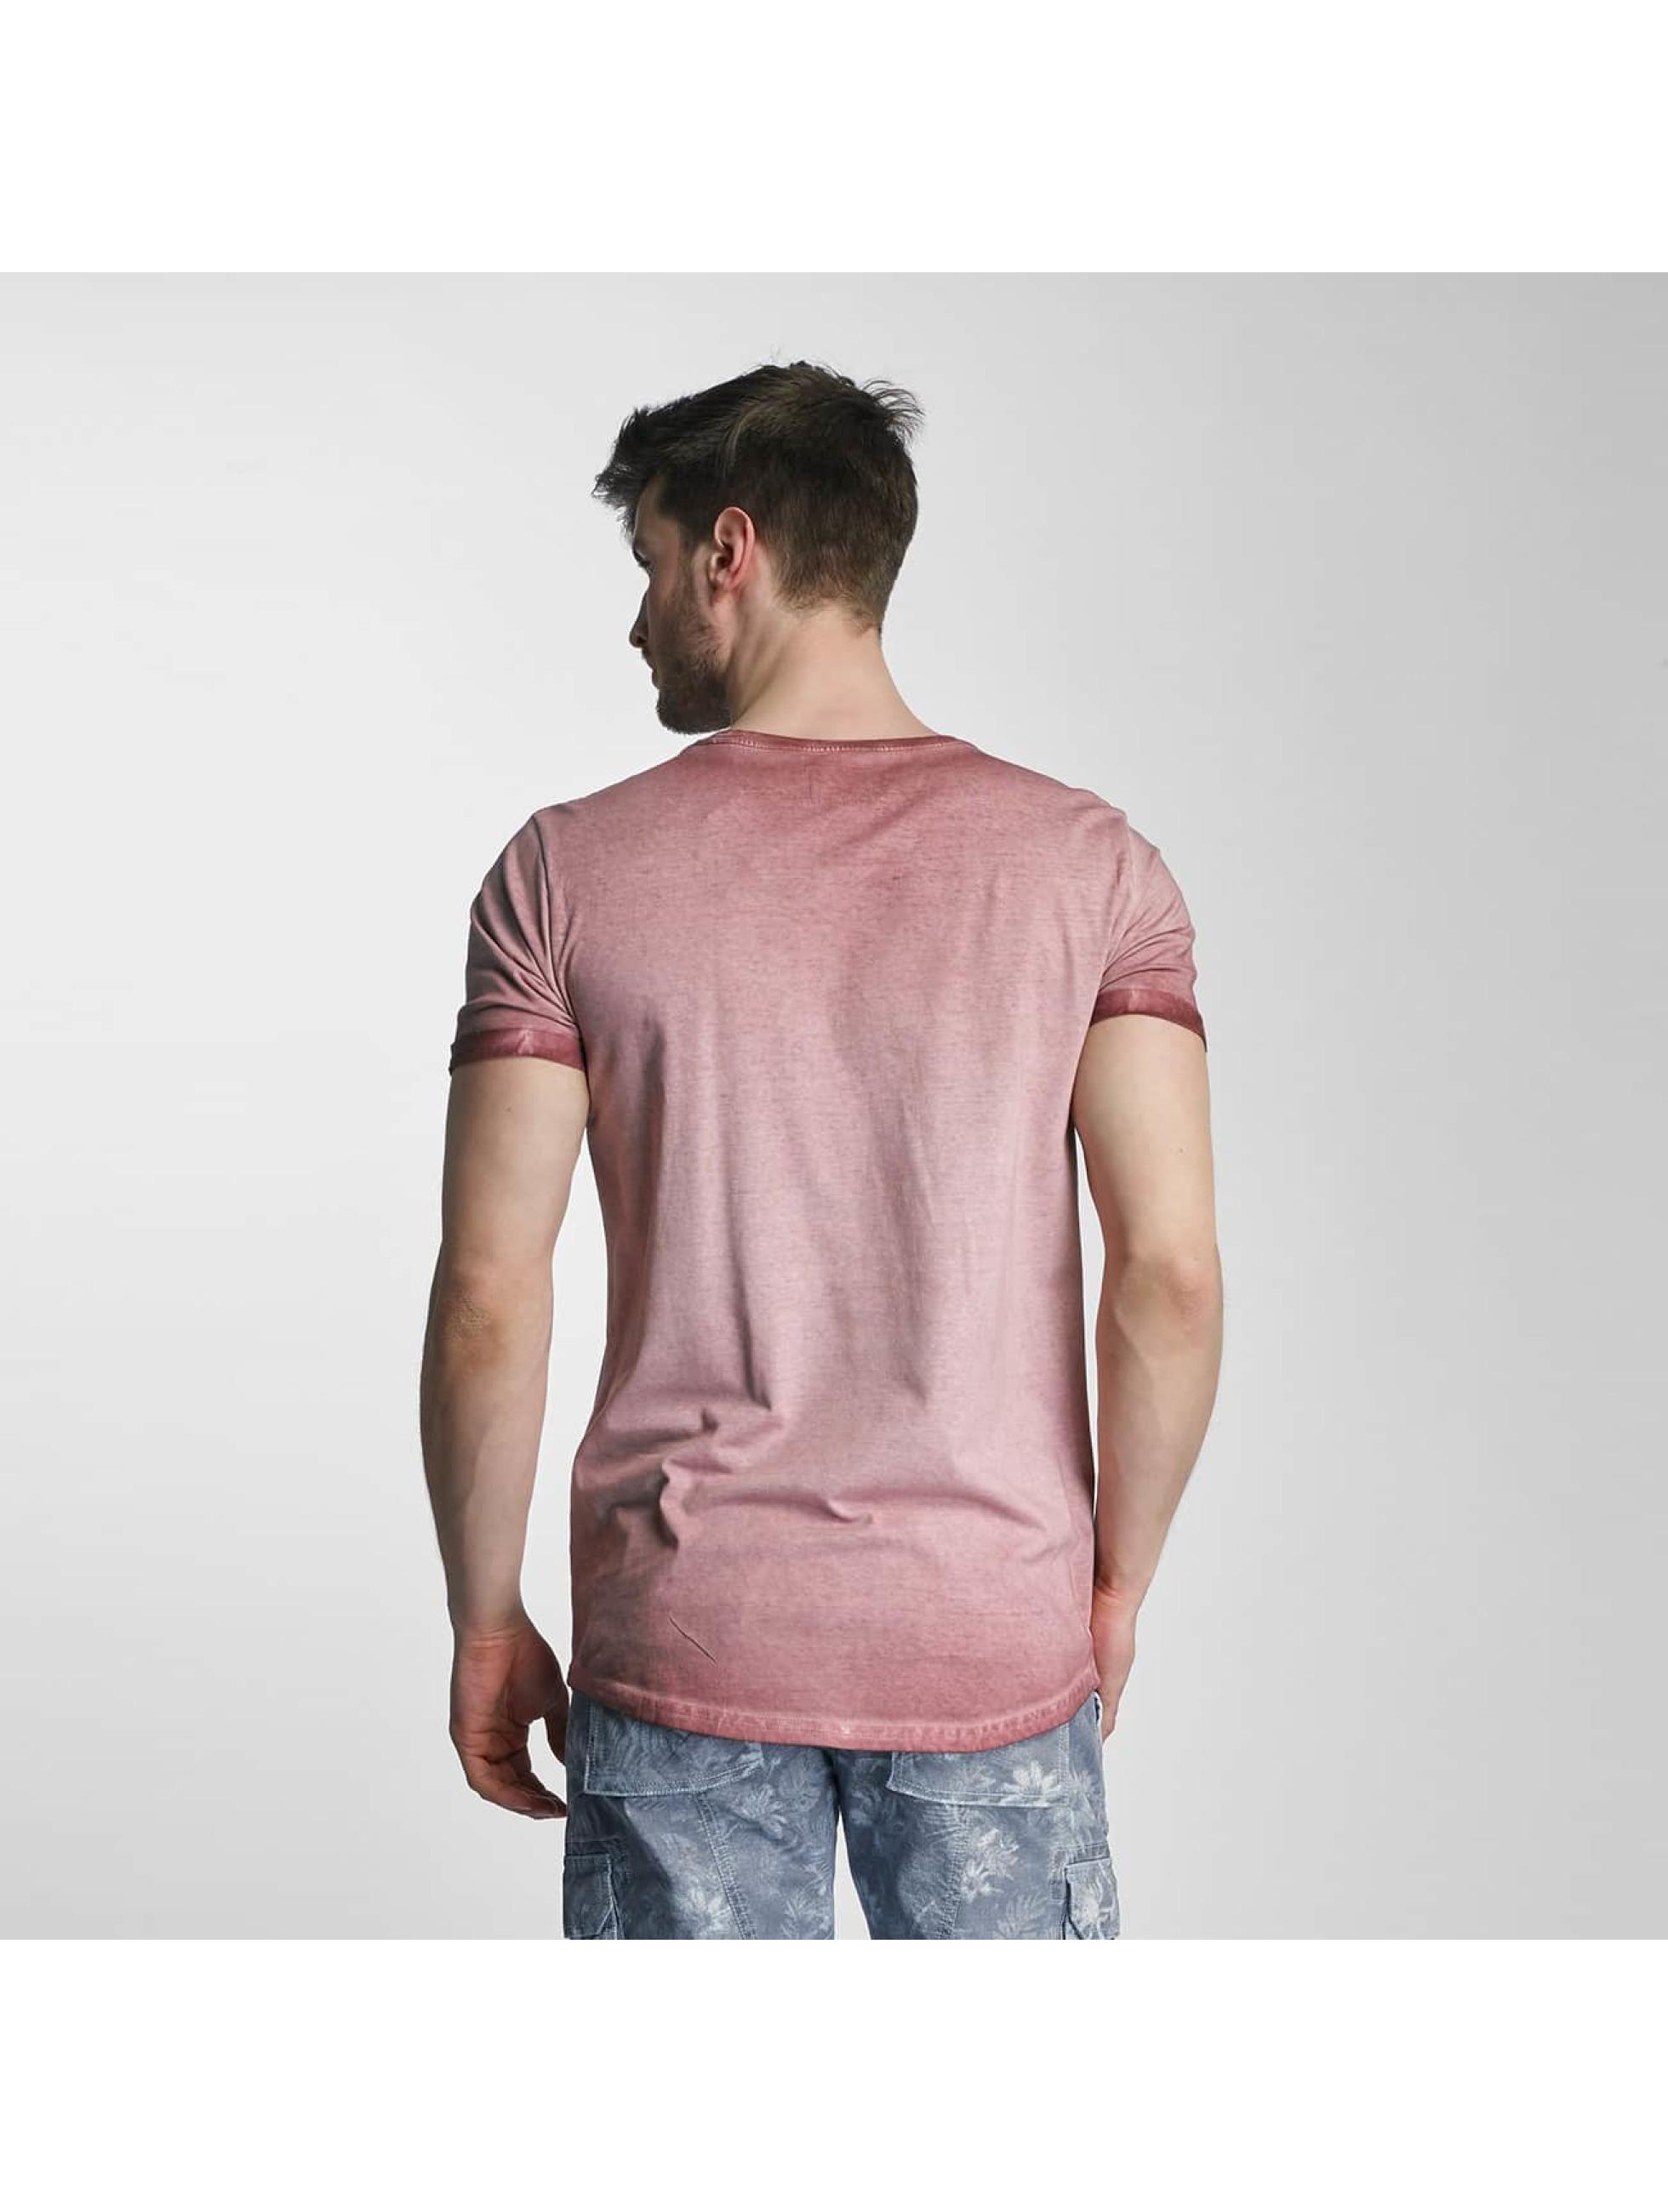 SHINE Original Tričká Dirt Dye Wash ružová